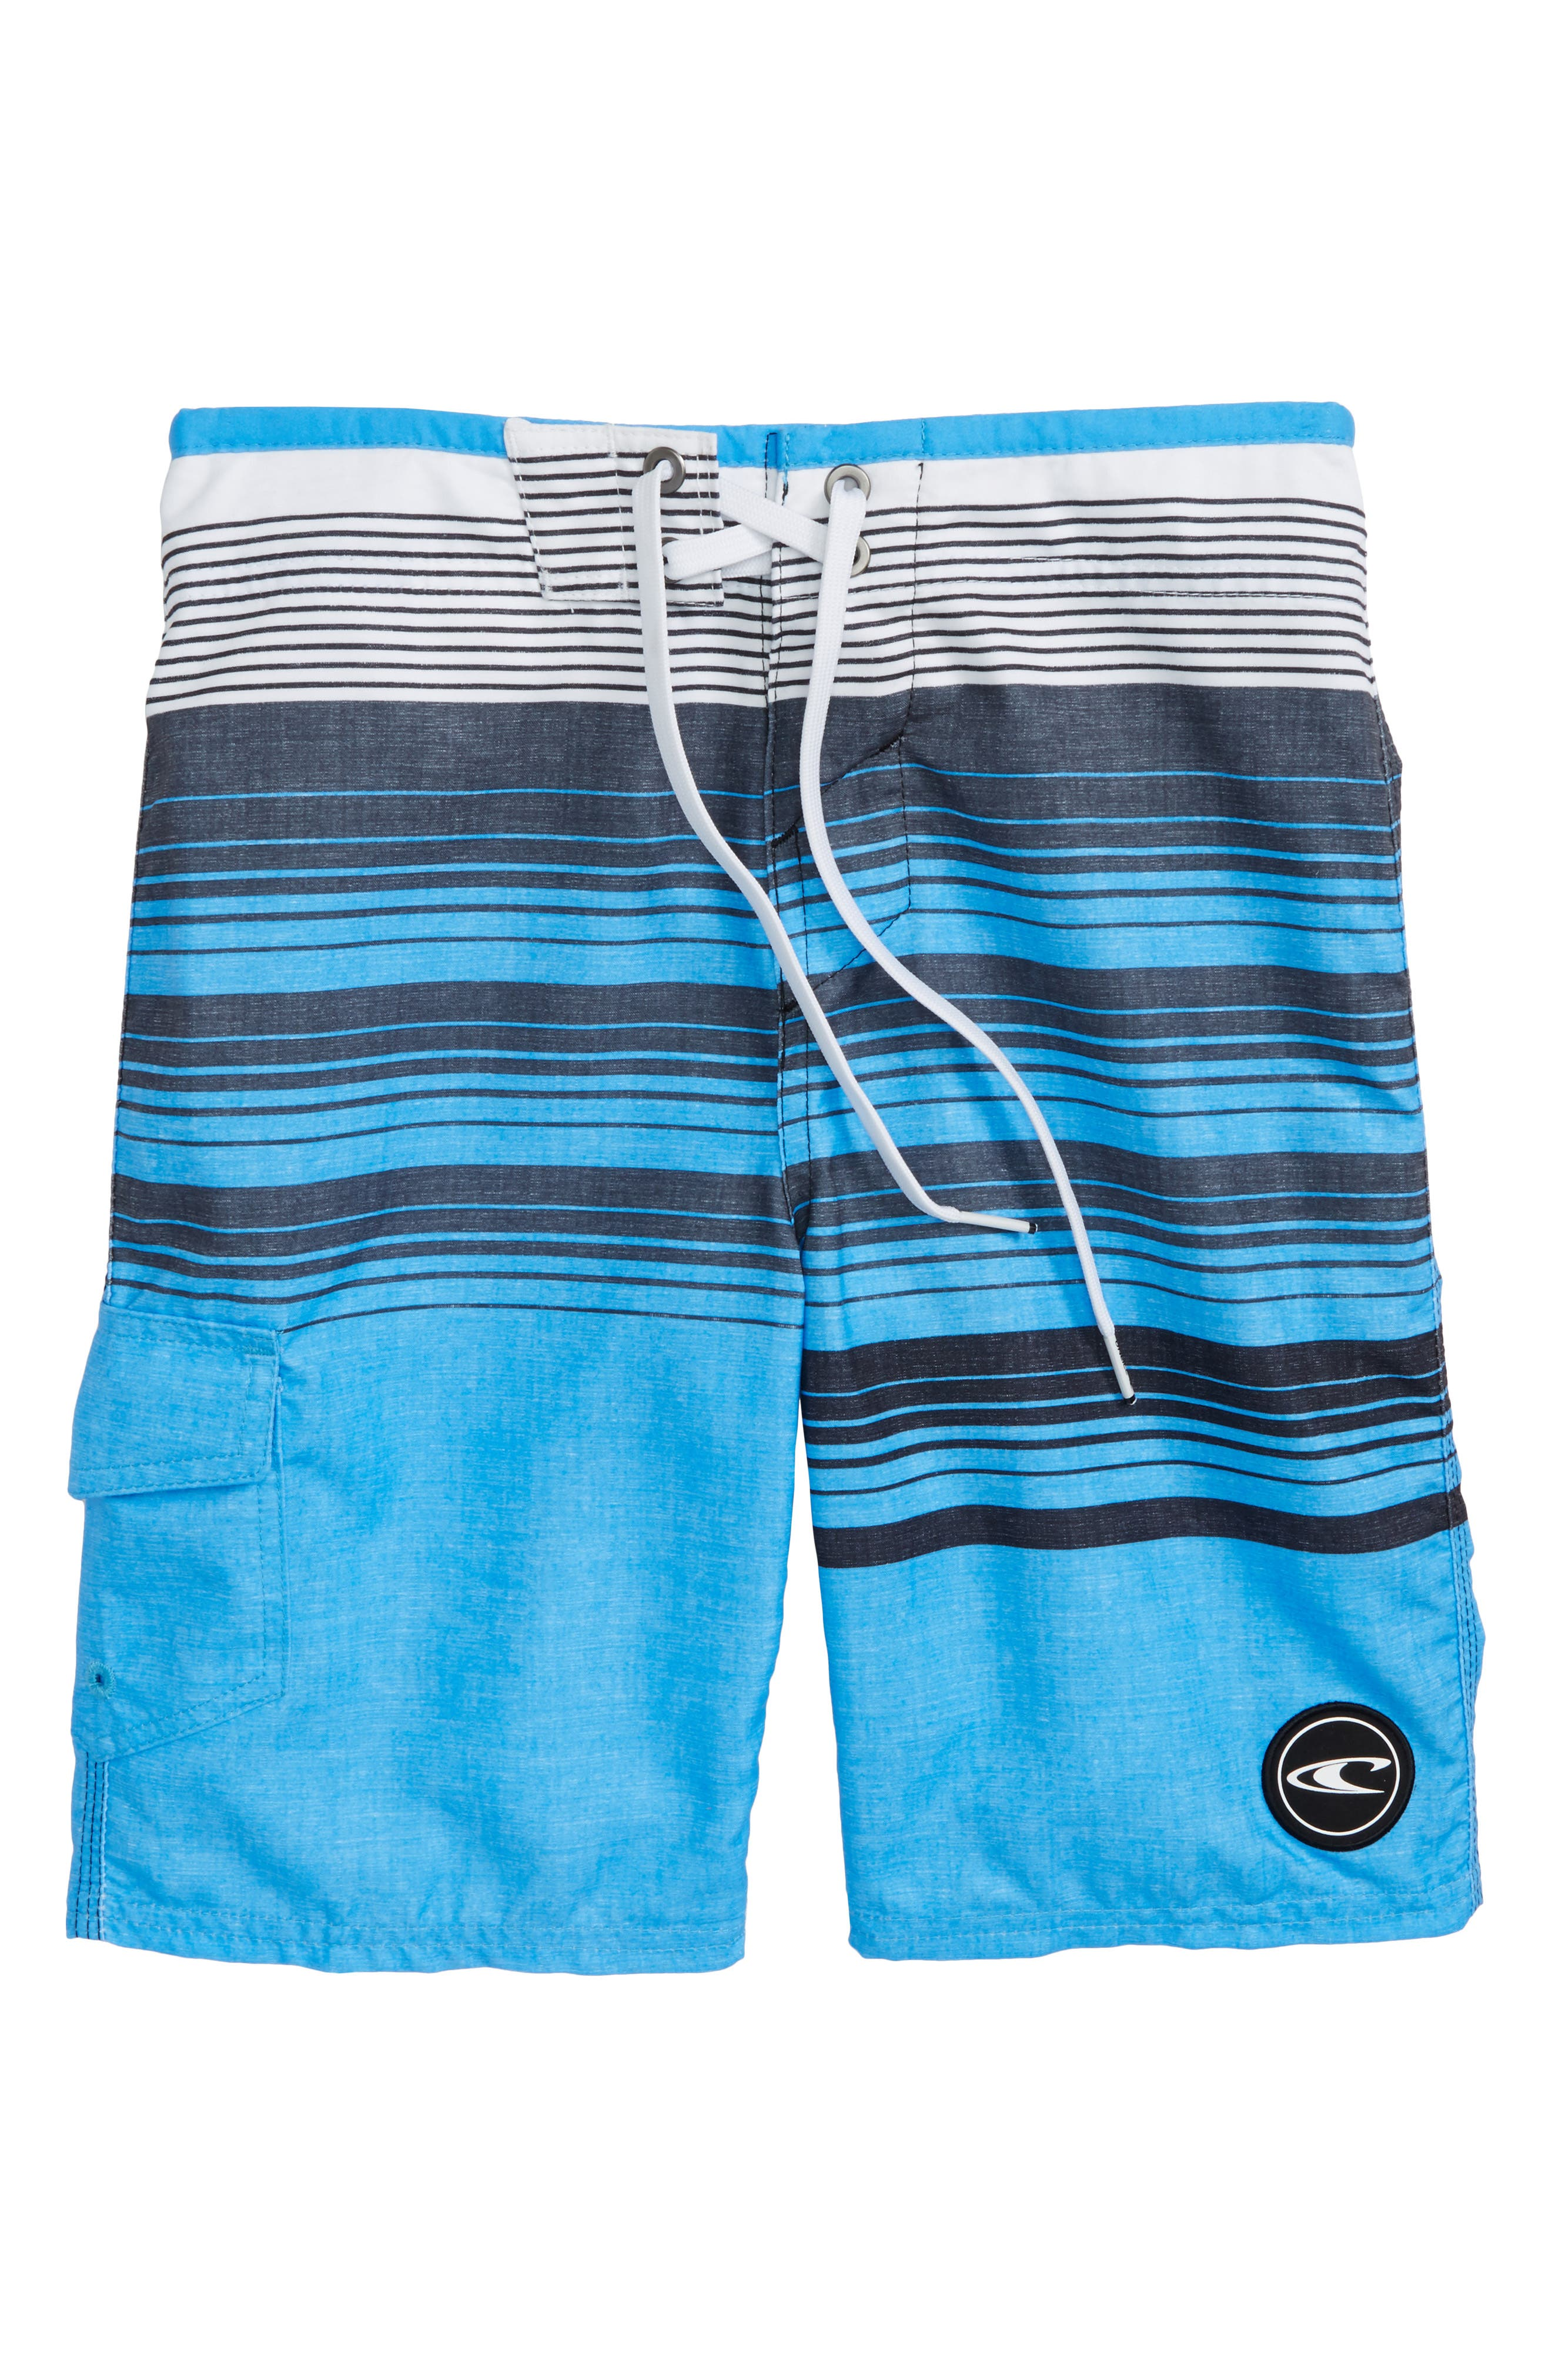 Bennett Board Shorts,                         Main,                         color, Blue